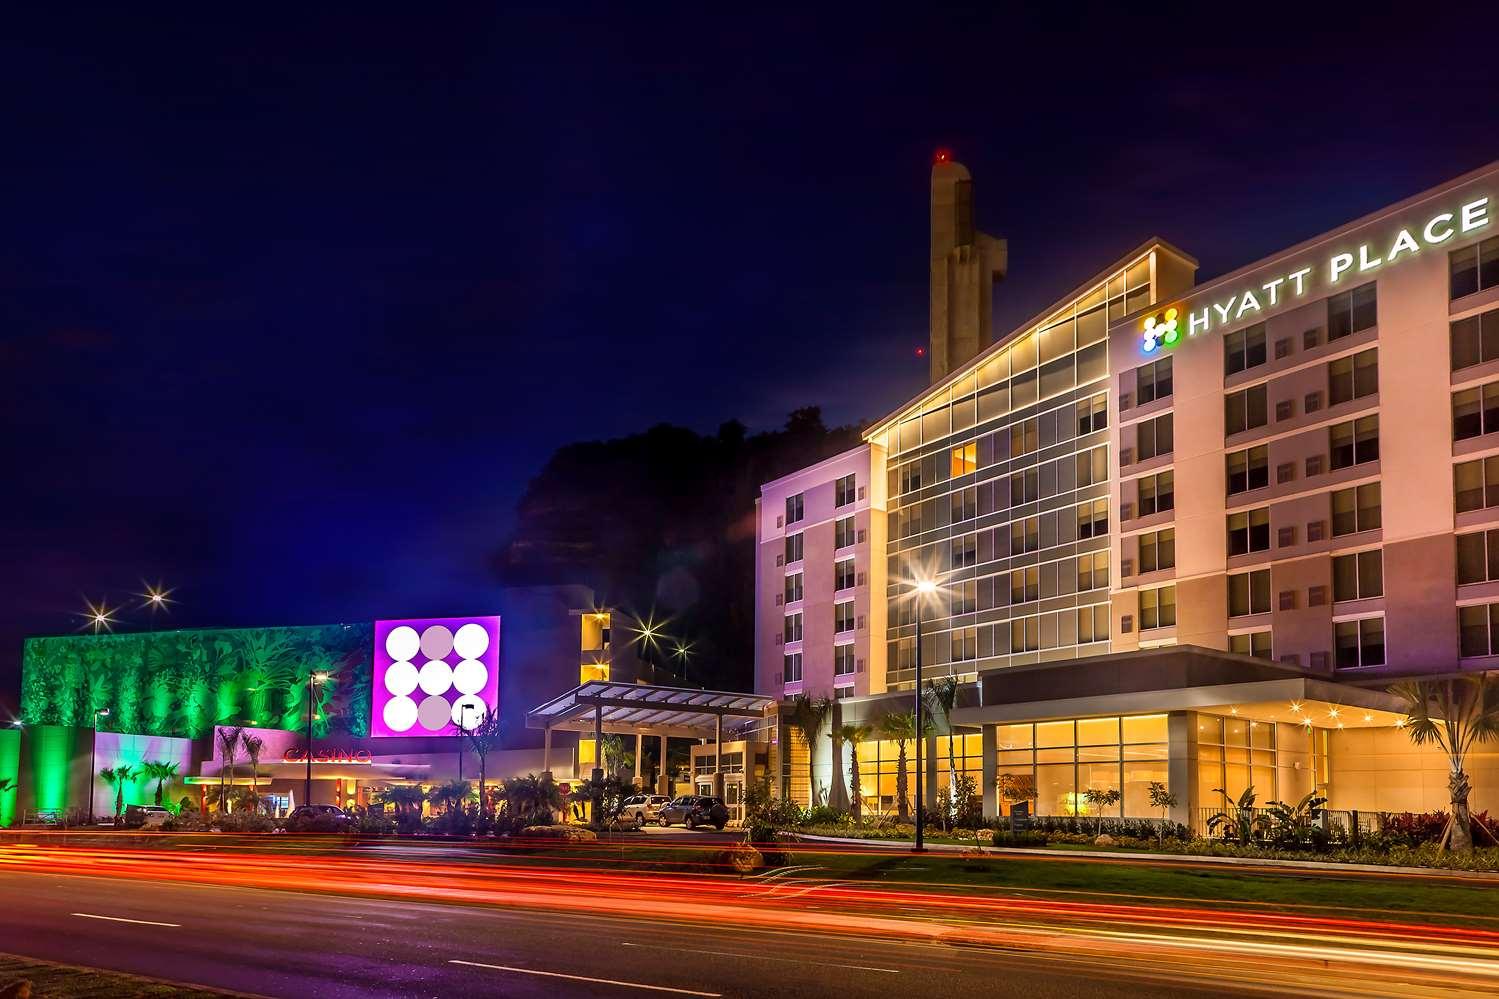 Exterior view - Hyatt Place Hotel Bayamon